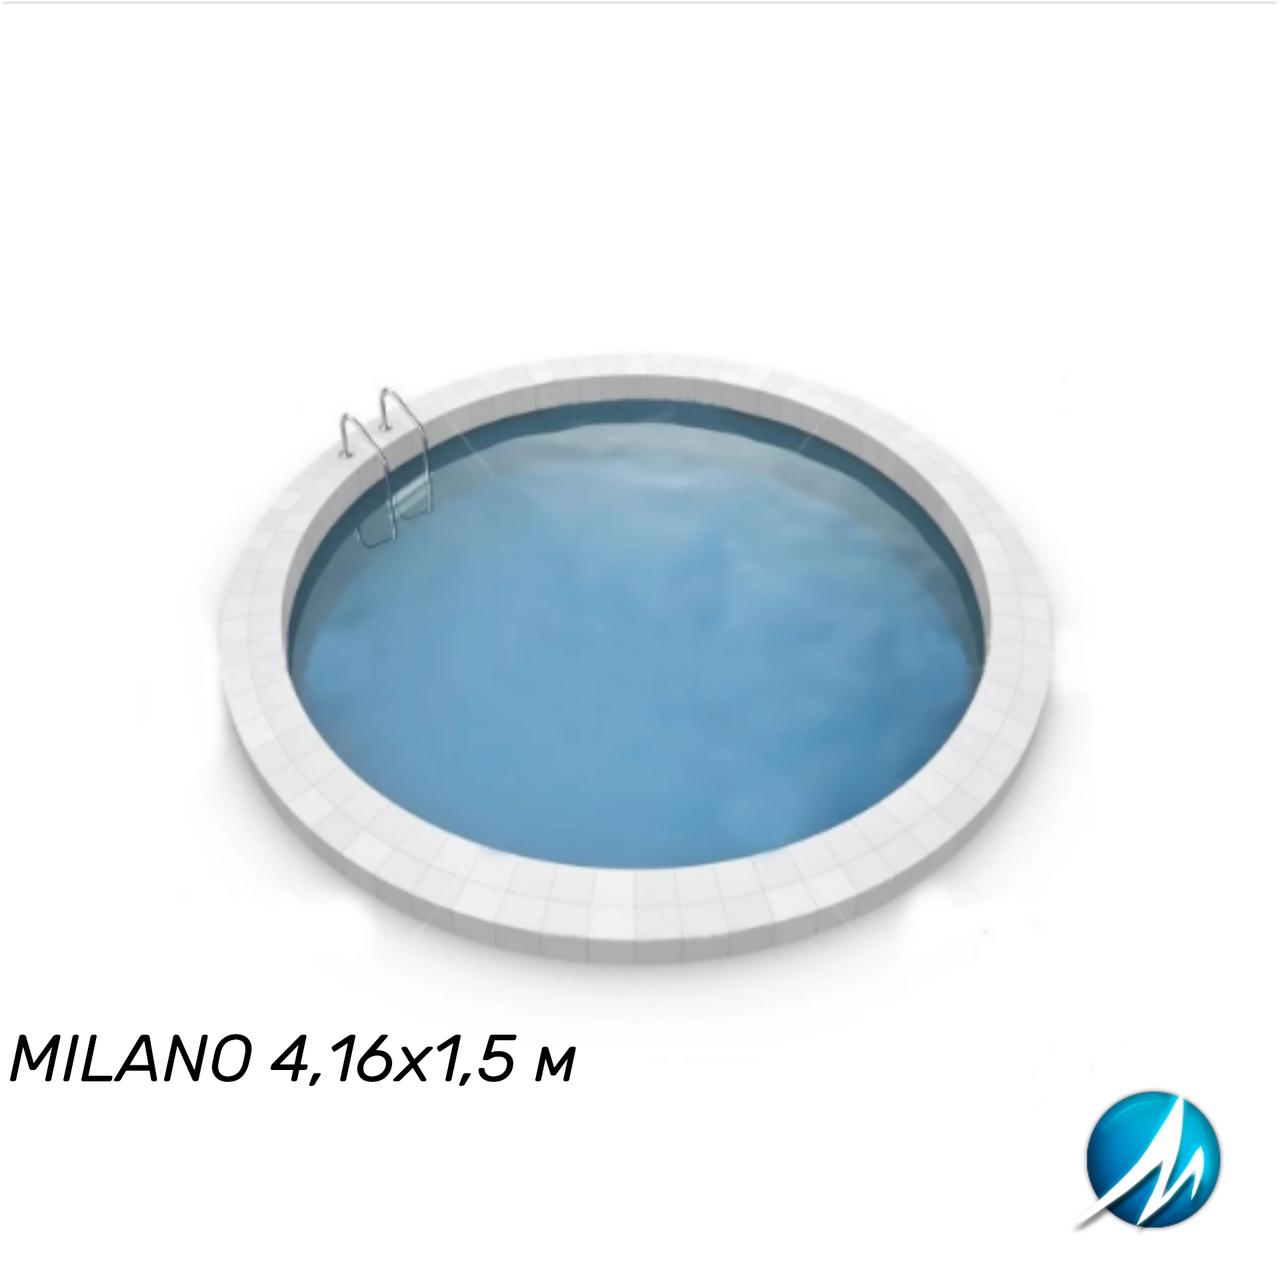 Сборный круглый бассейн MILANO 4,16х1,5 м, пленка 0,6 мм